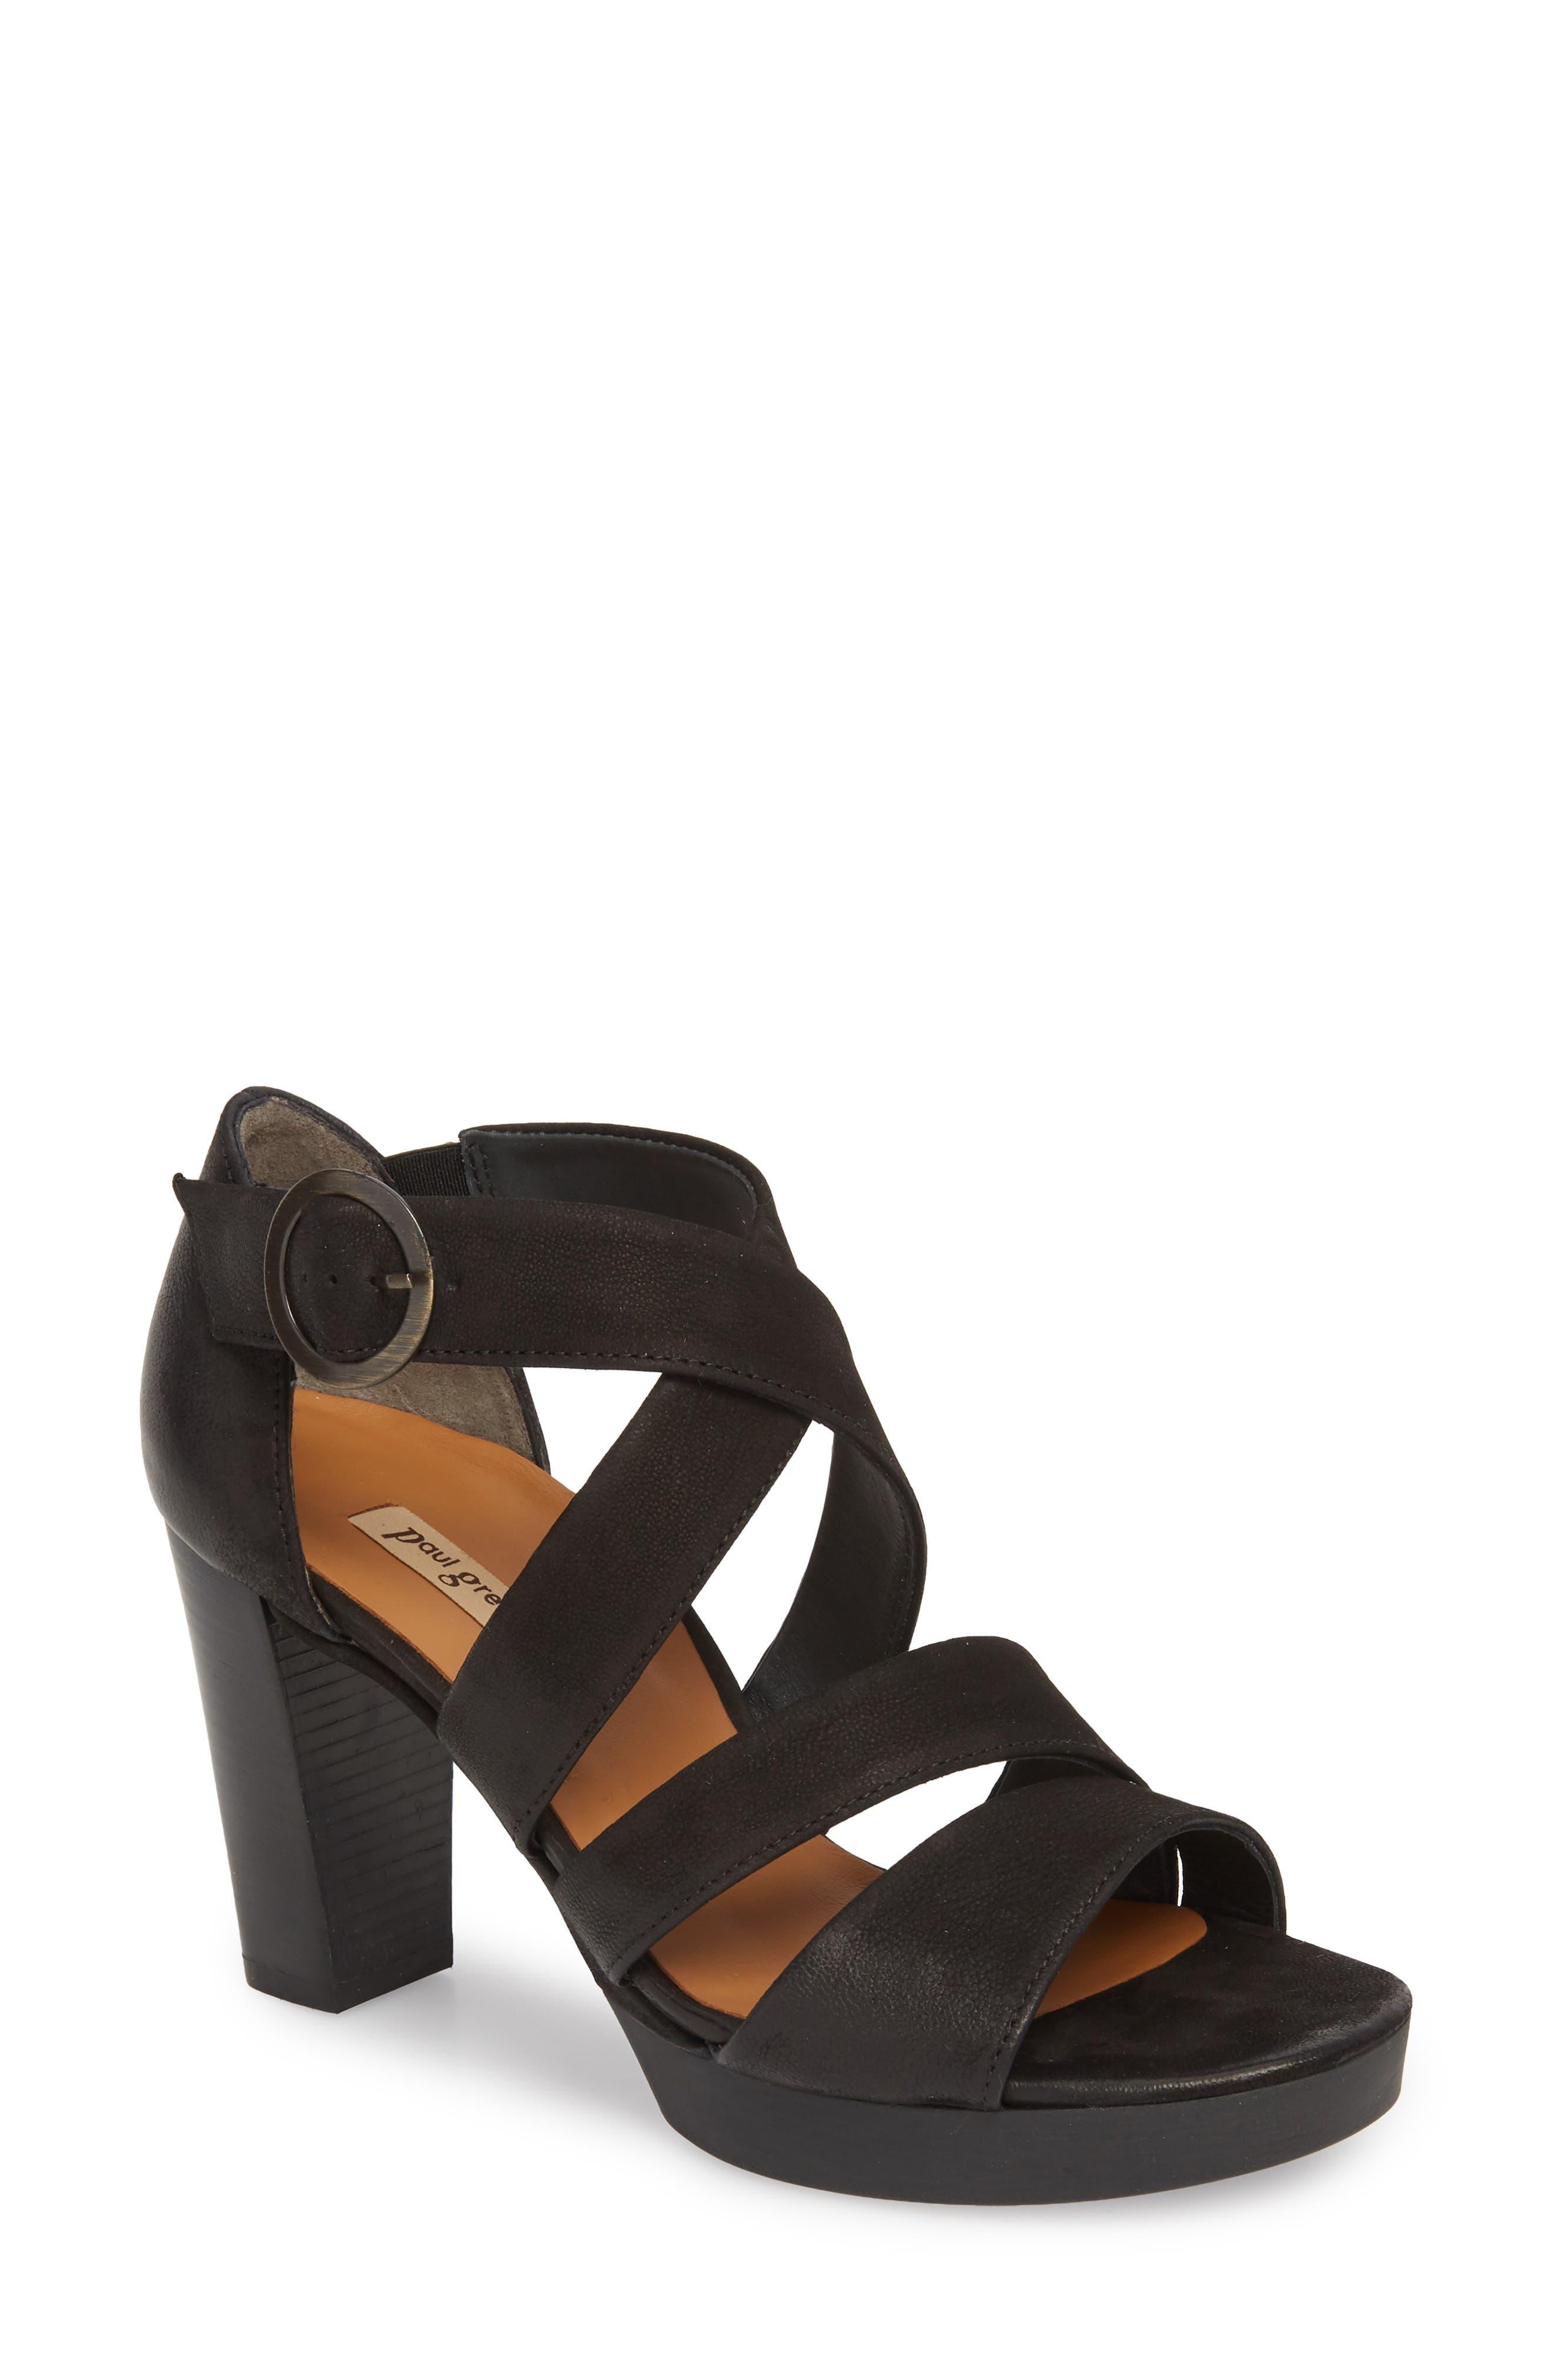 Alternate Image 1 Selected - Paul Green Riviera Strappy Sandal (Women)